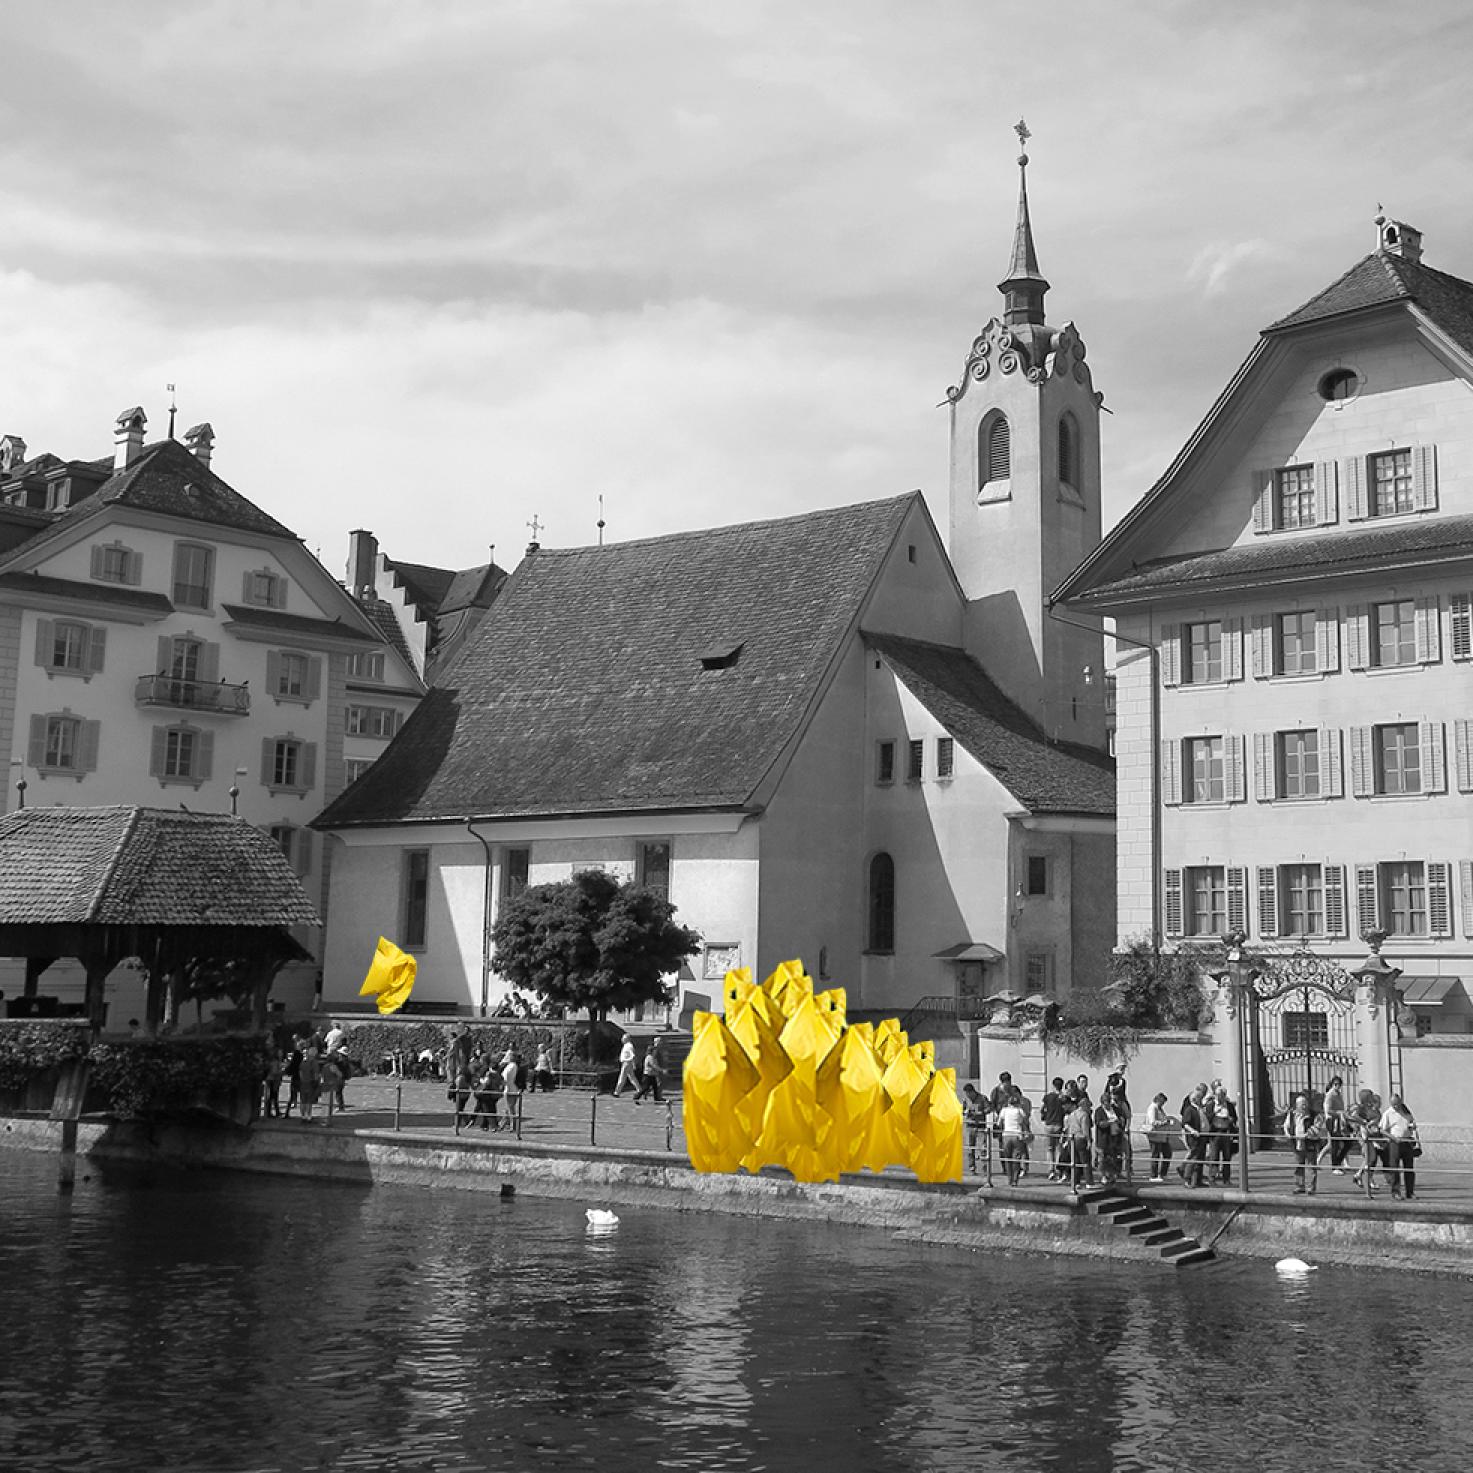 Angstkörper in Gelb